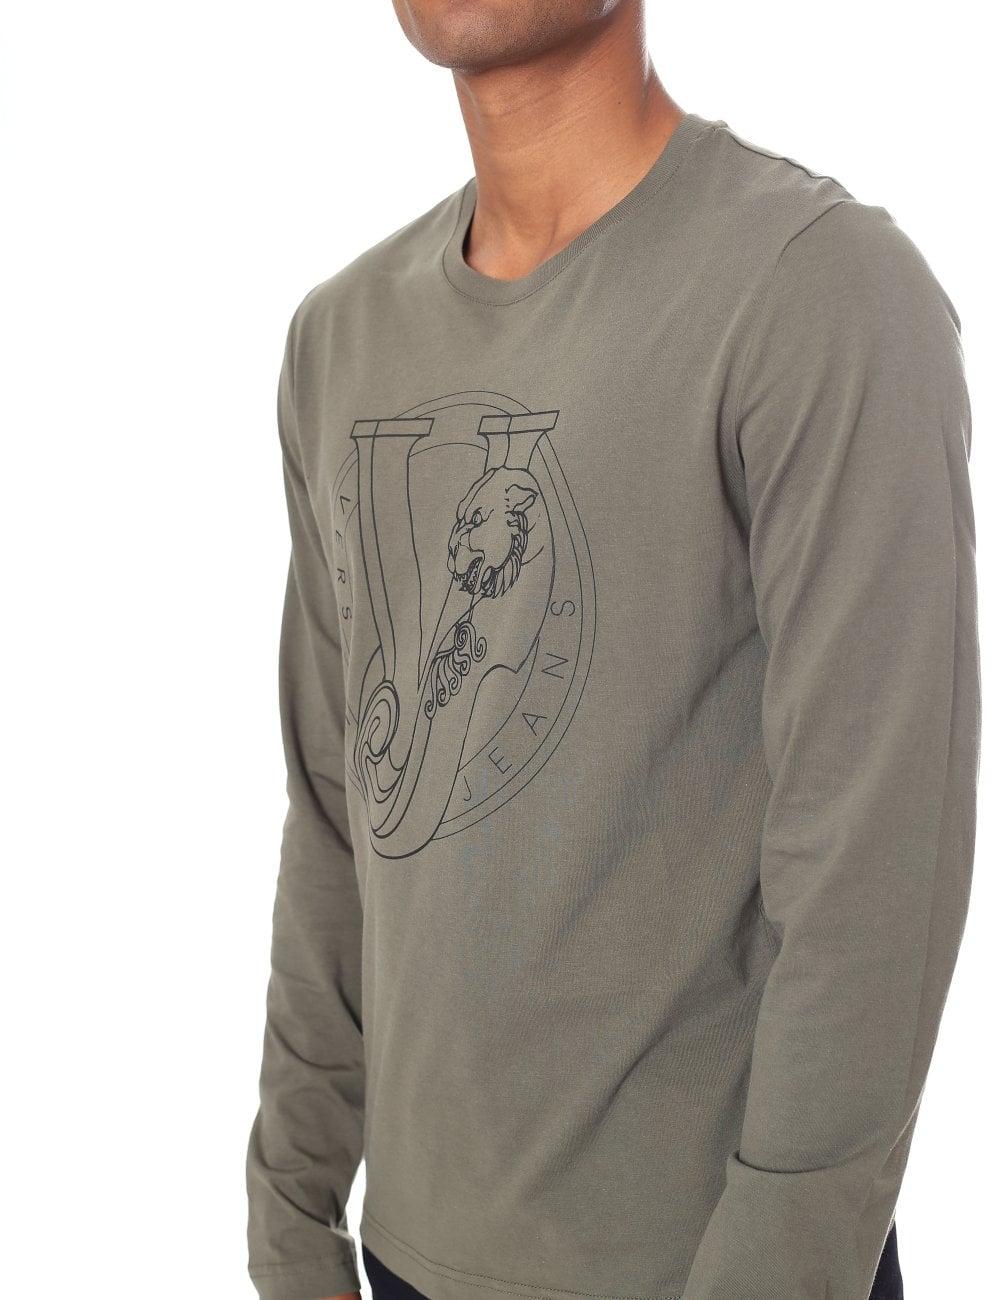 36119227c47fc Versace Jeans Men s VJ Logo Long Sleeve Tee